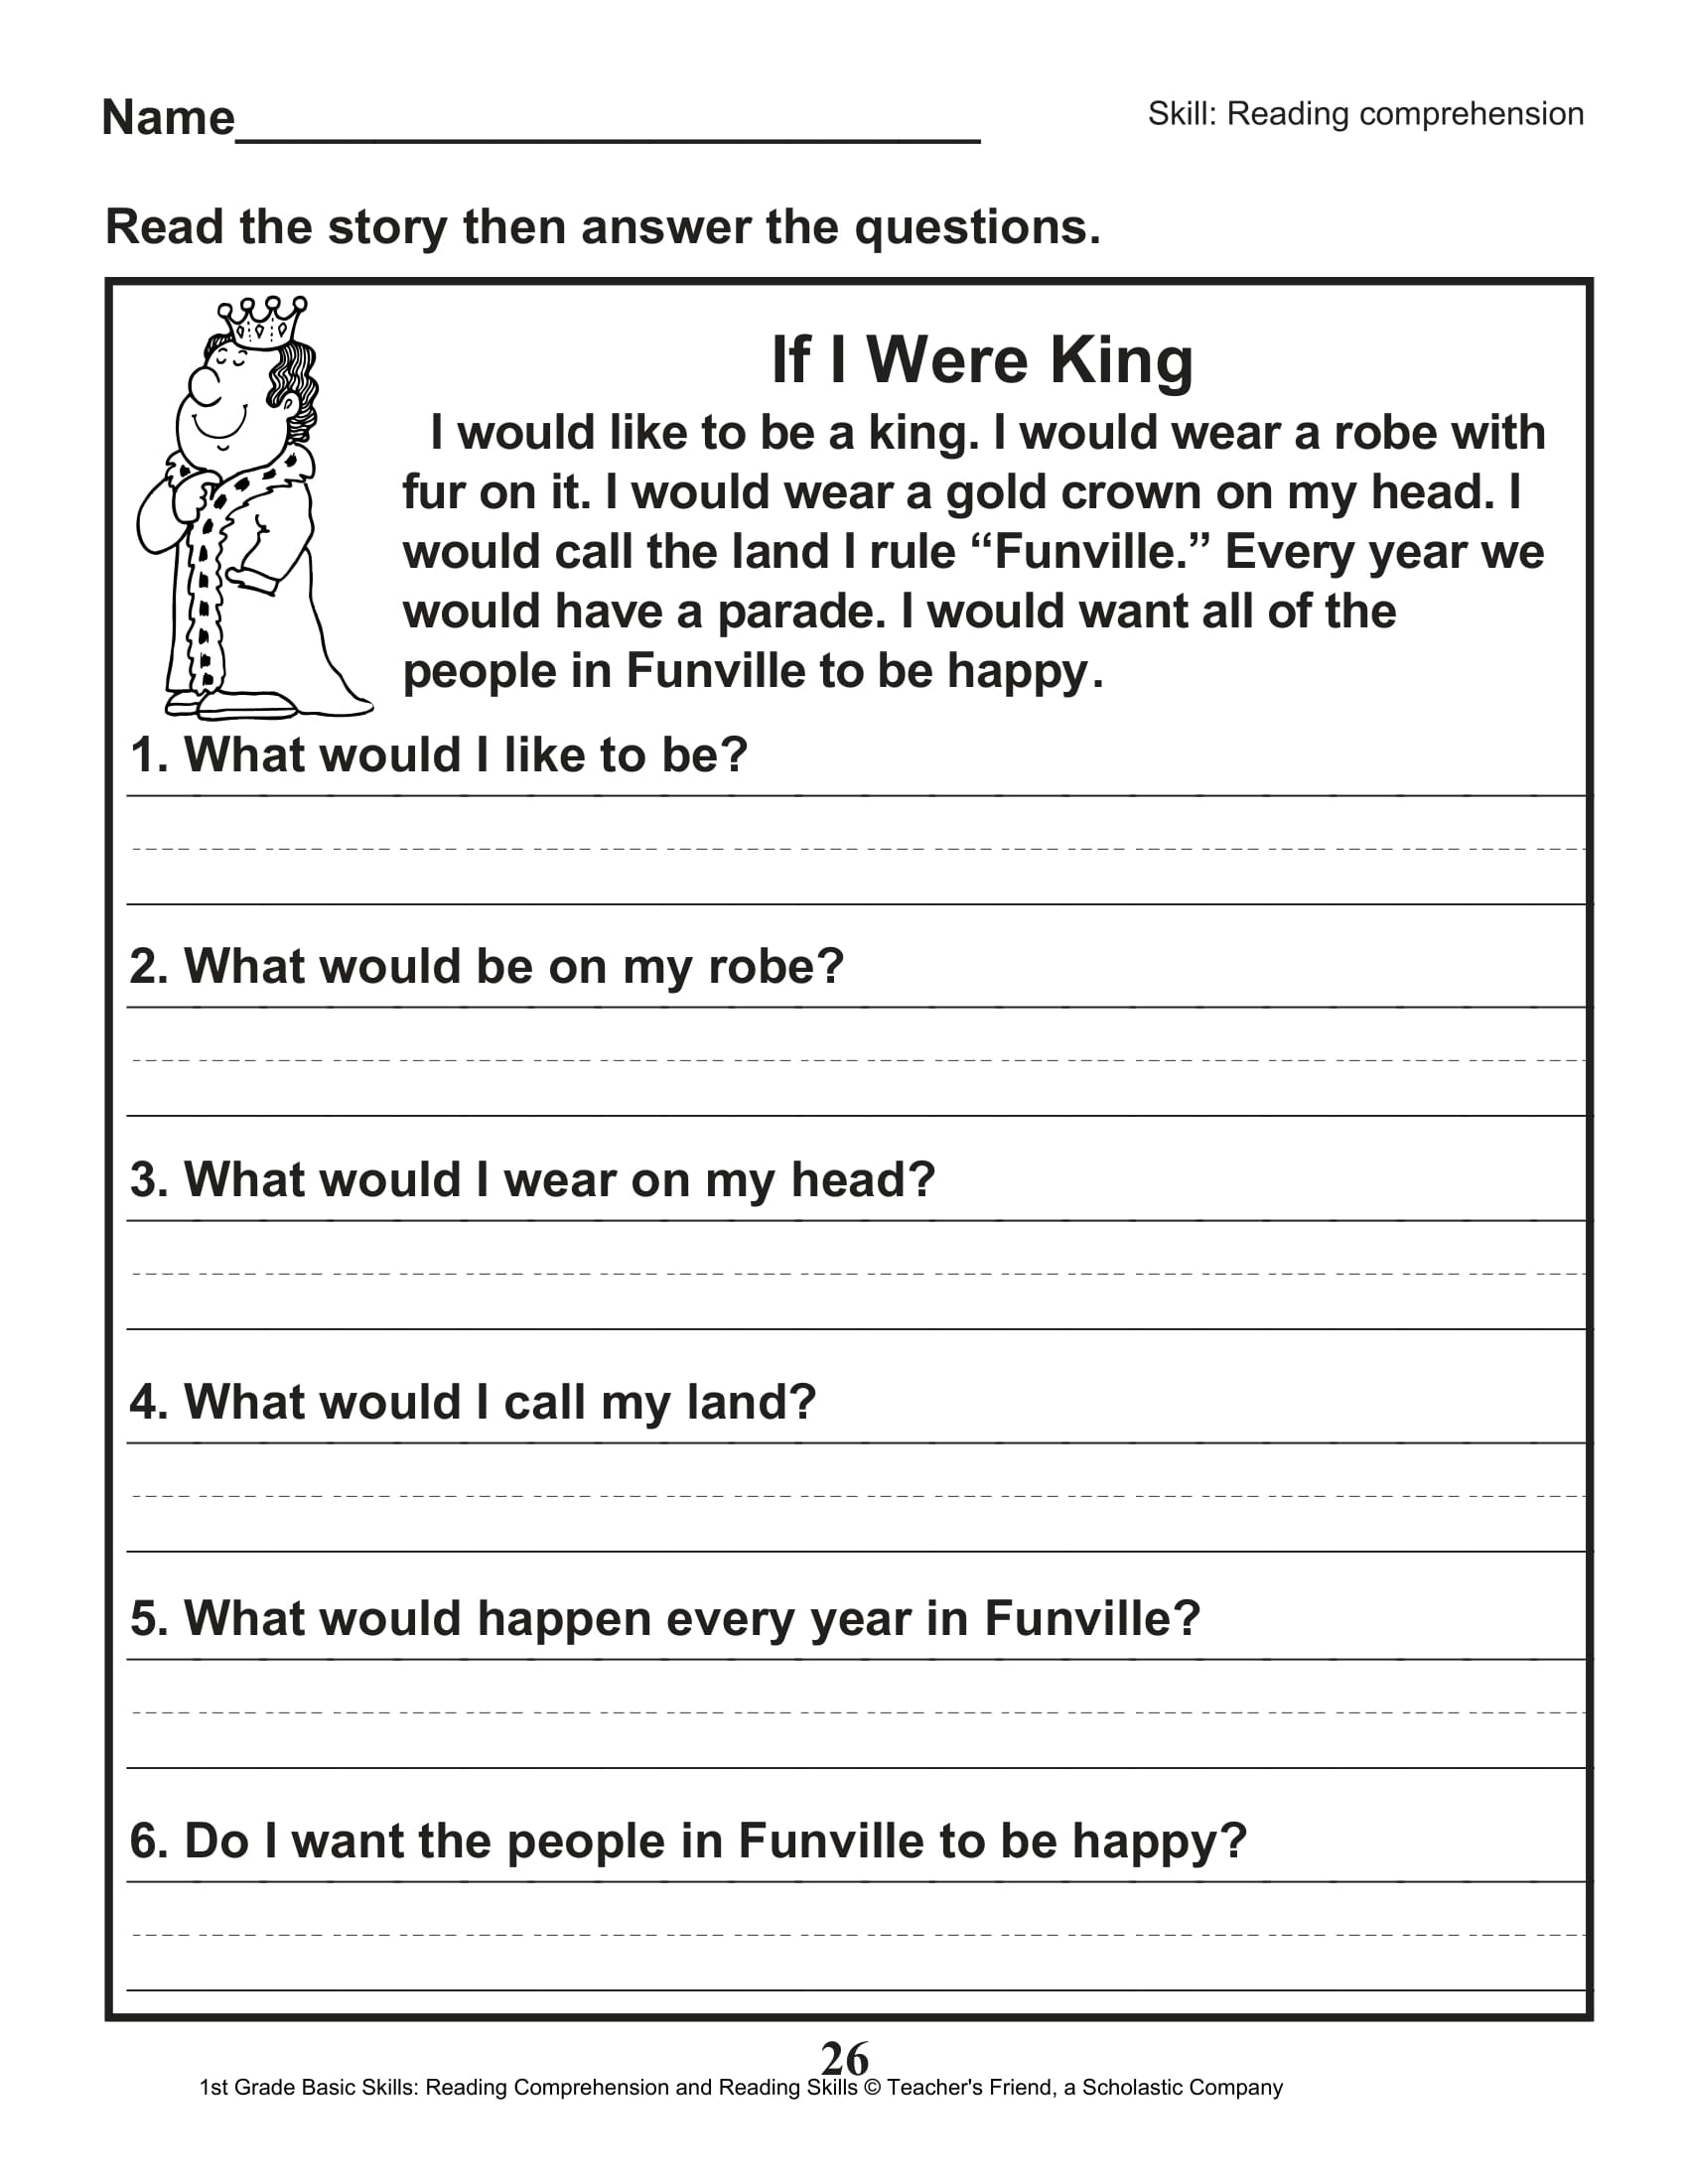 Scholastic 1st Grade Reading Comprehension Skills Worksheets 27